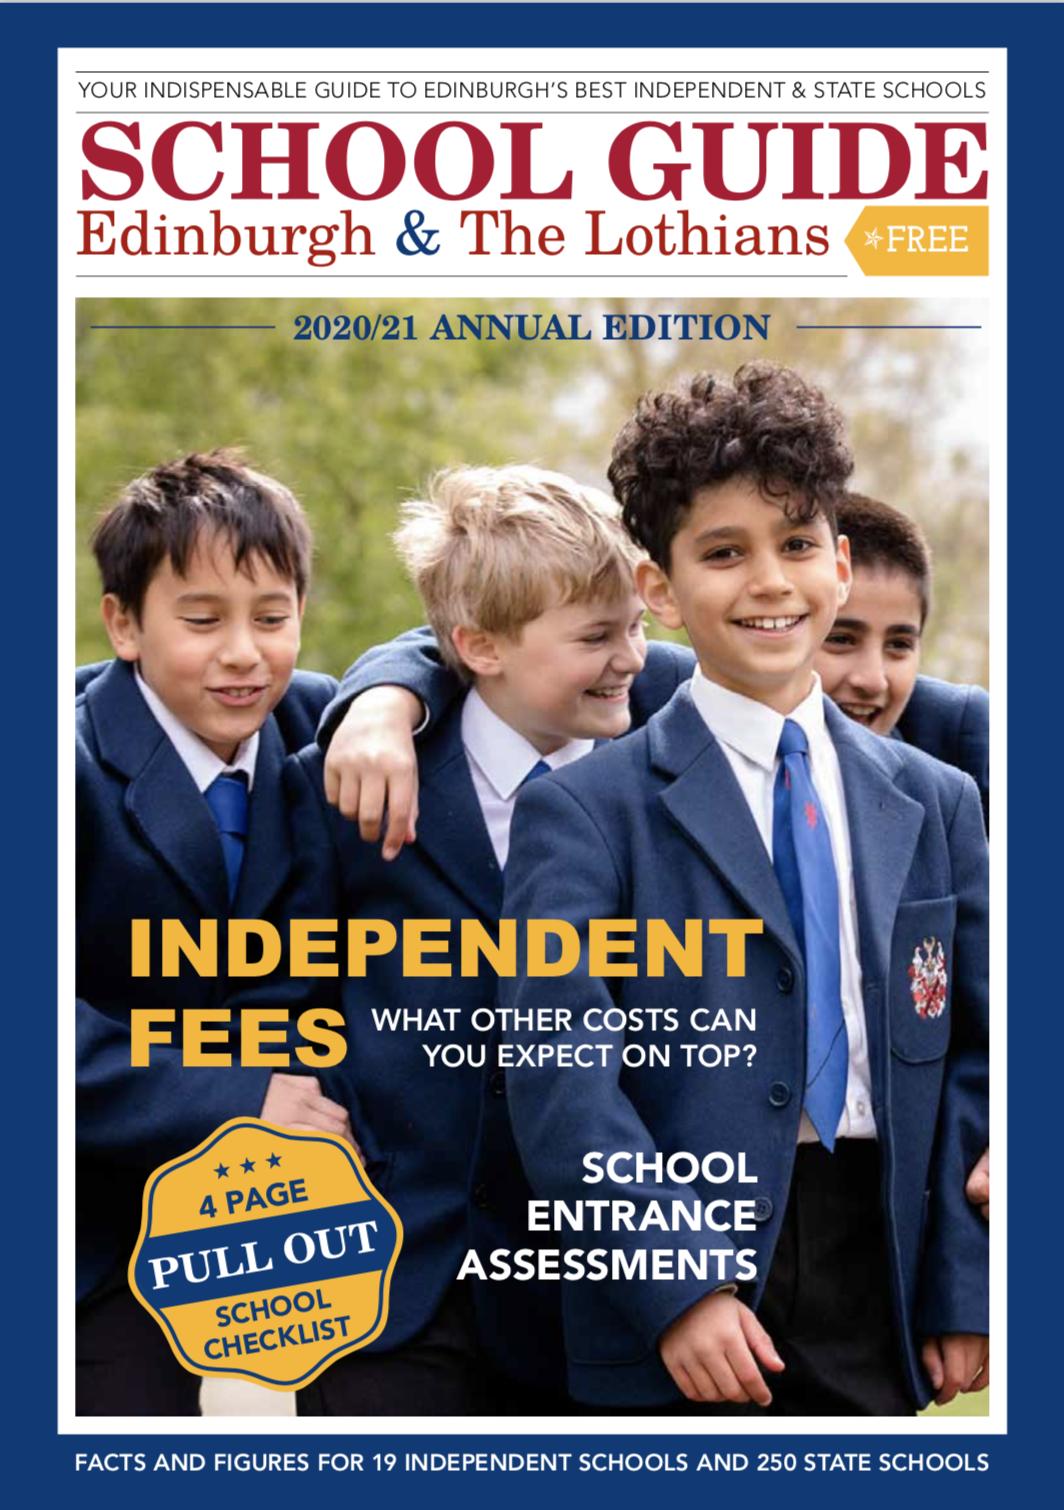 School Guide 2020/21 - Digital edition